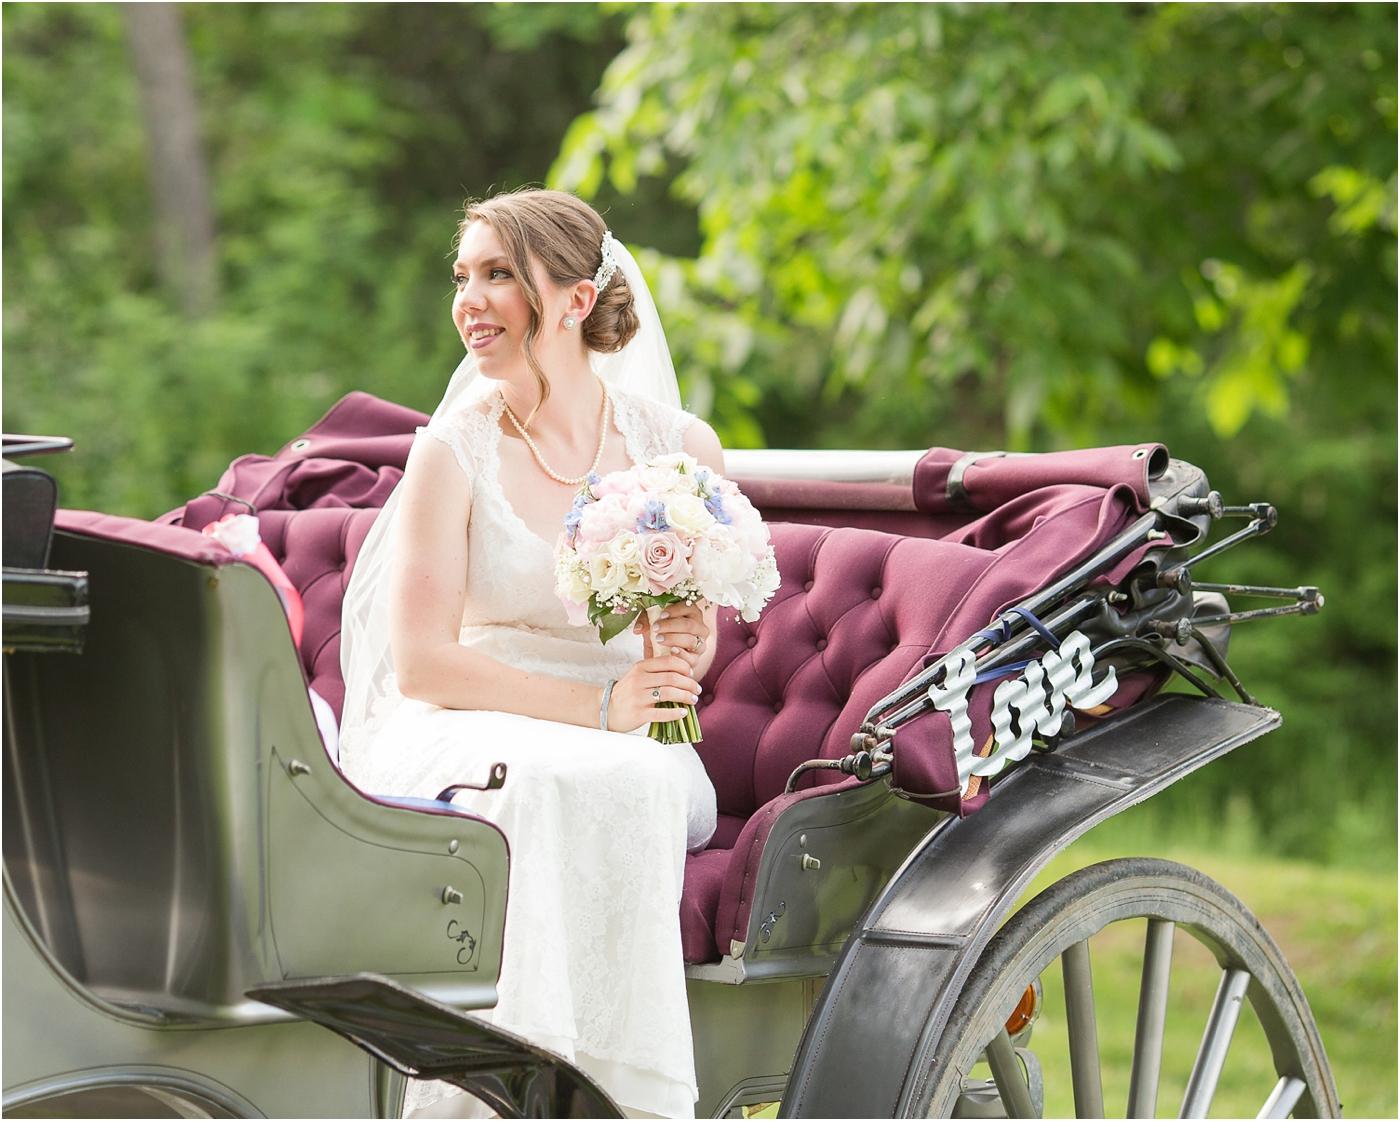 Gettysburg-lodges-wedding-photos-49.jpg